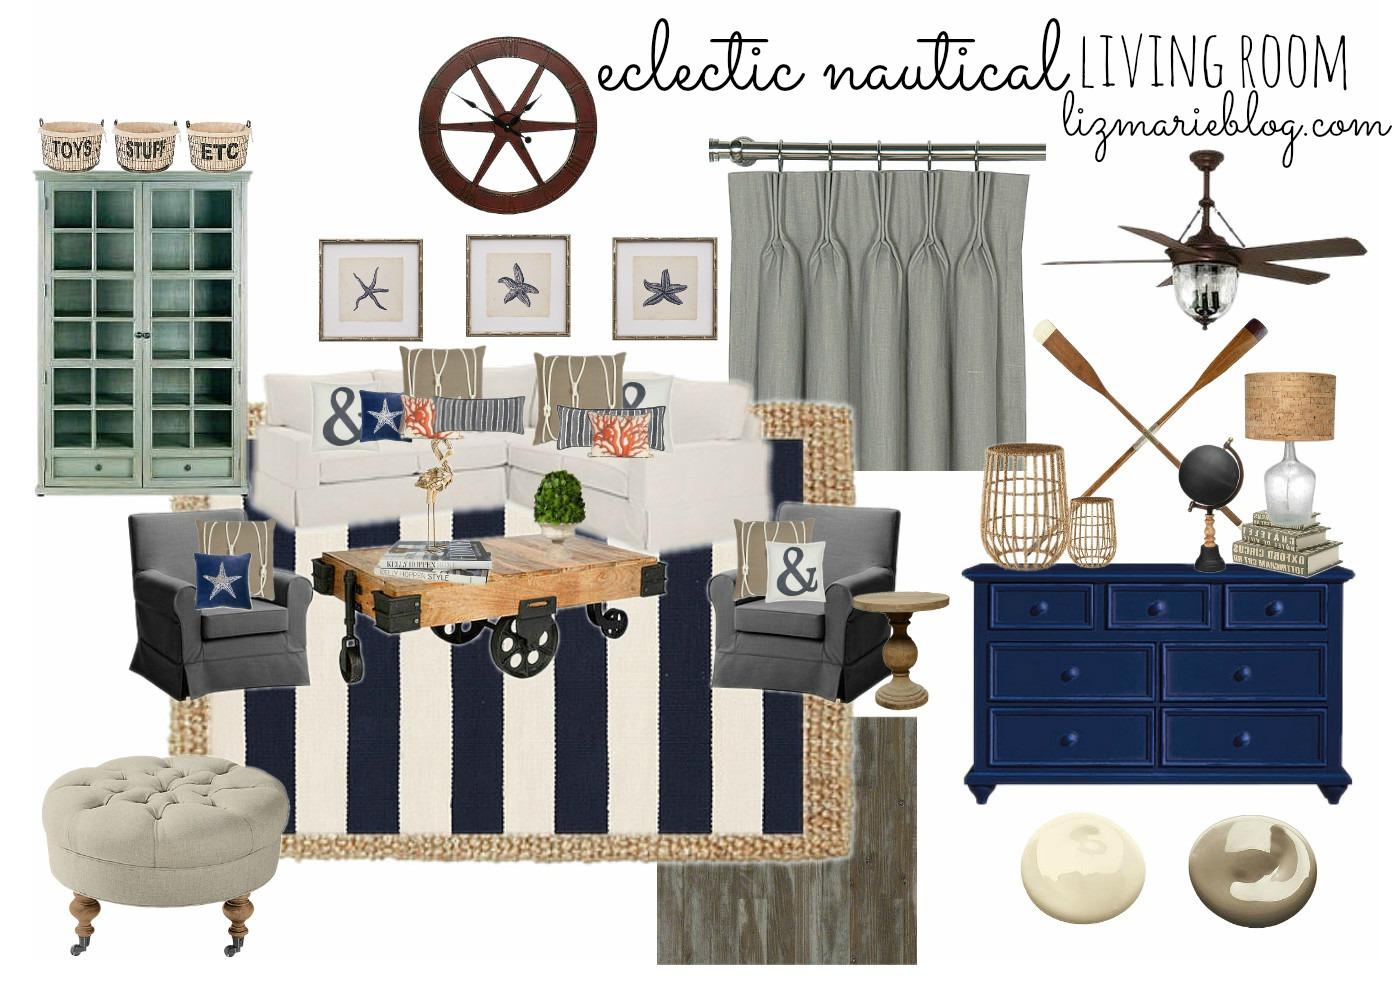 Eclectic Nautical Living Room - Liz Marie Blog